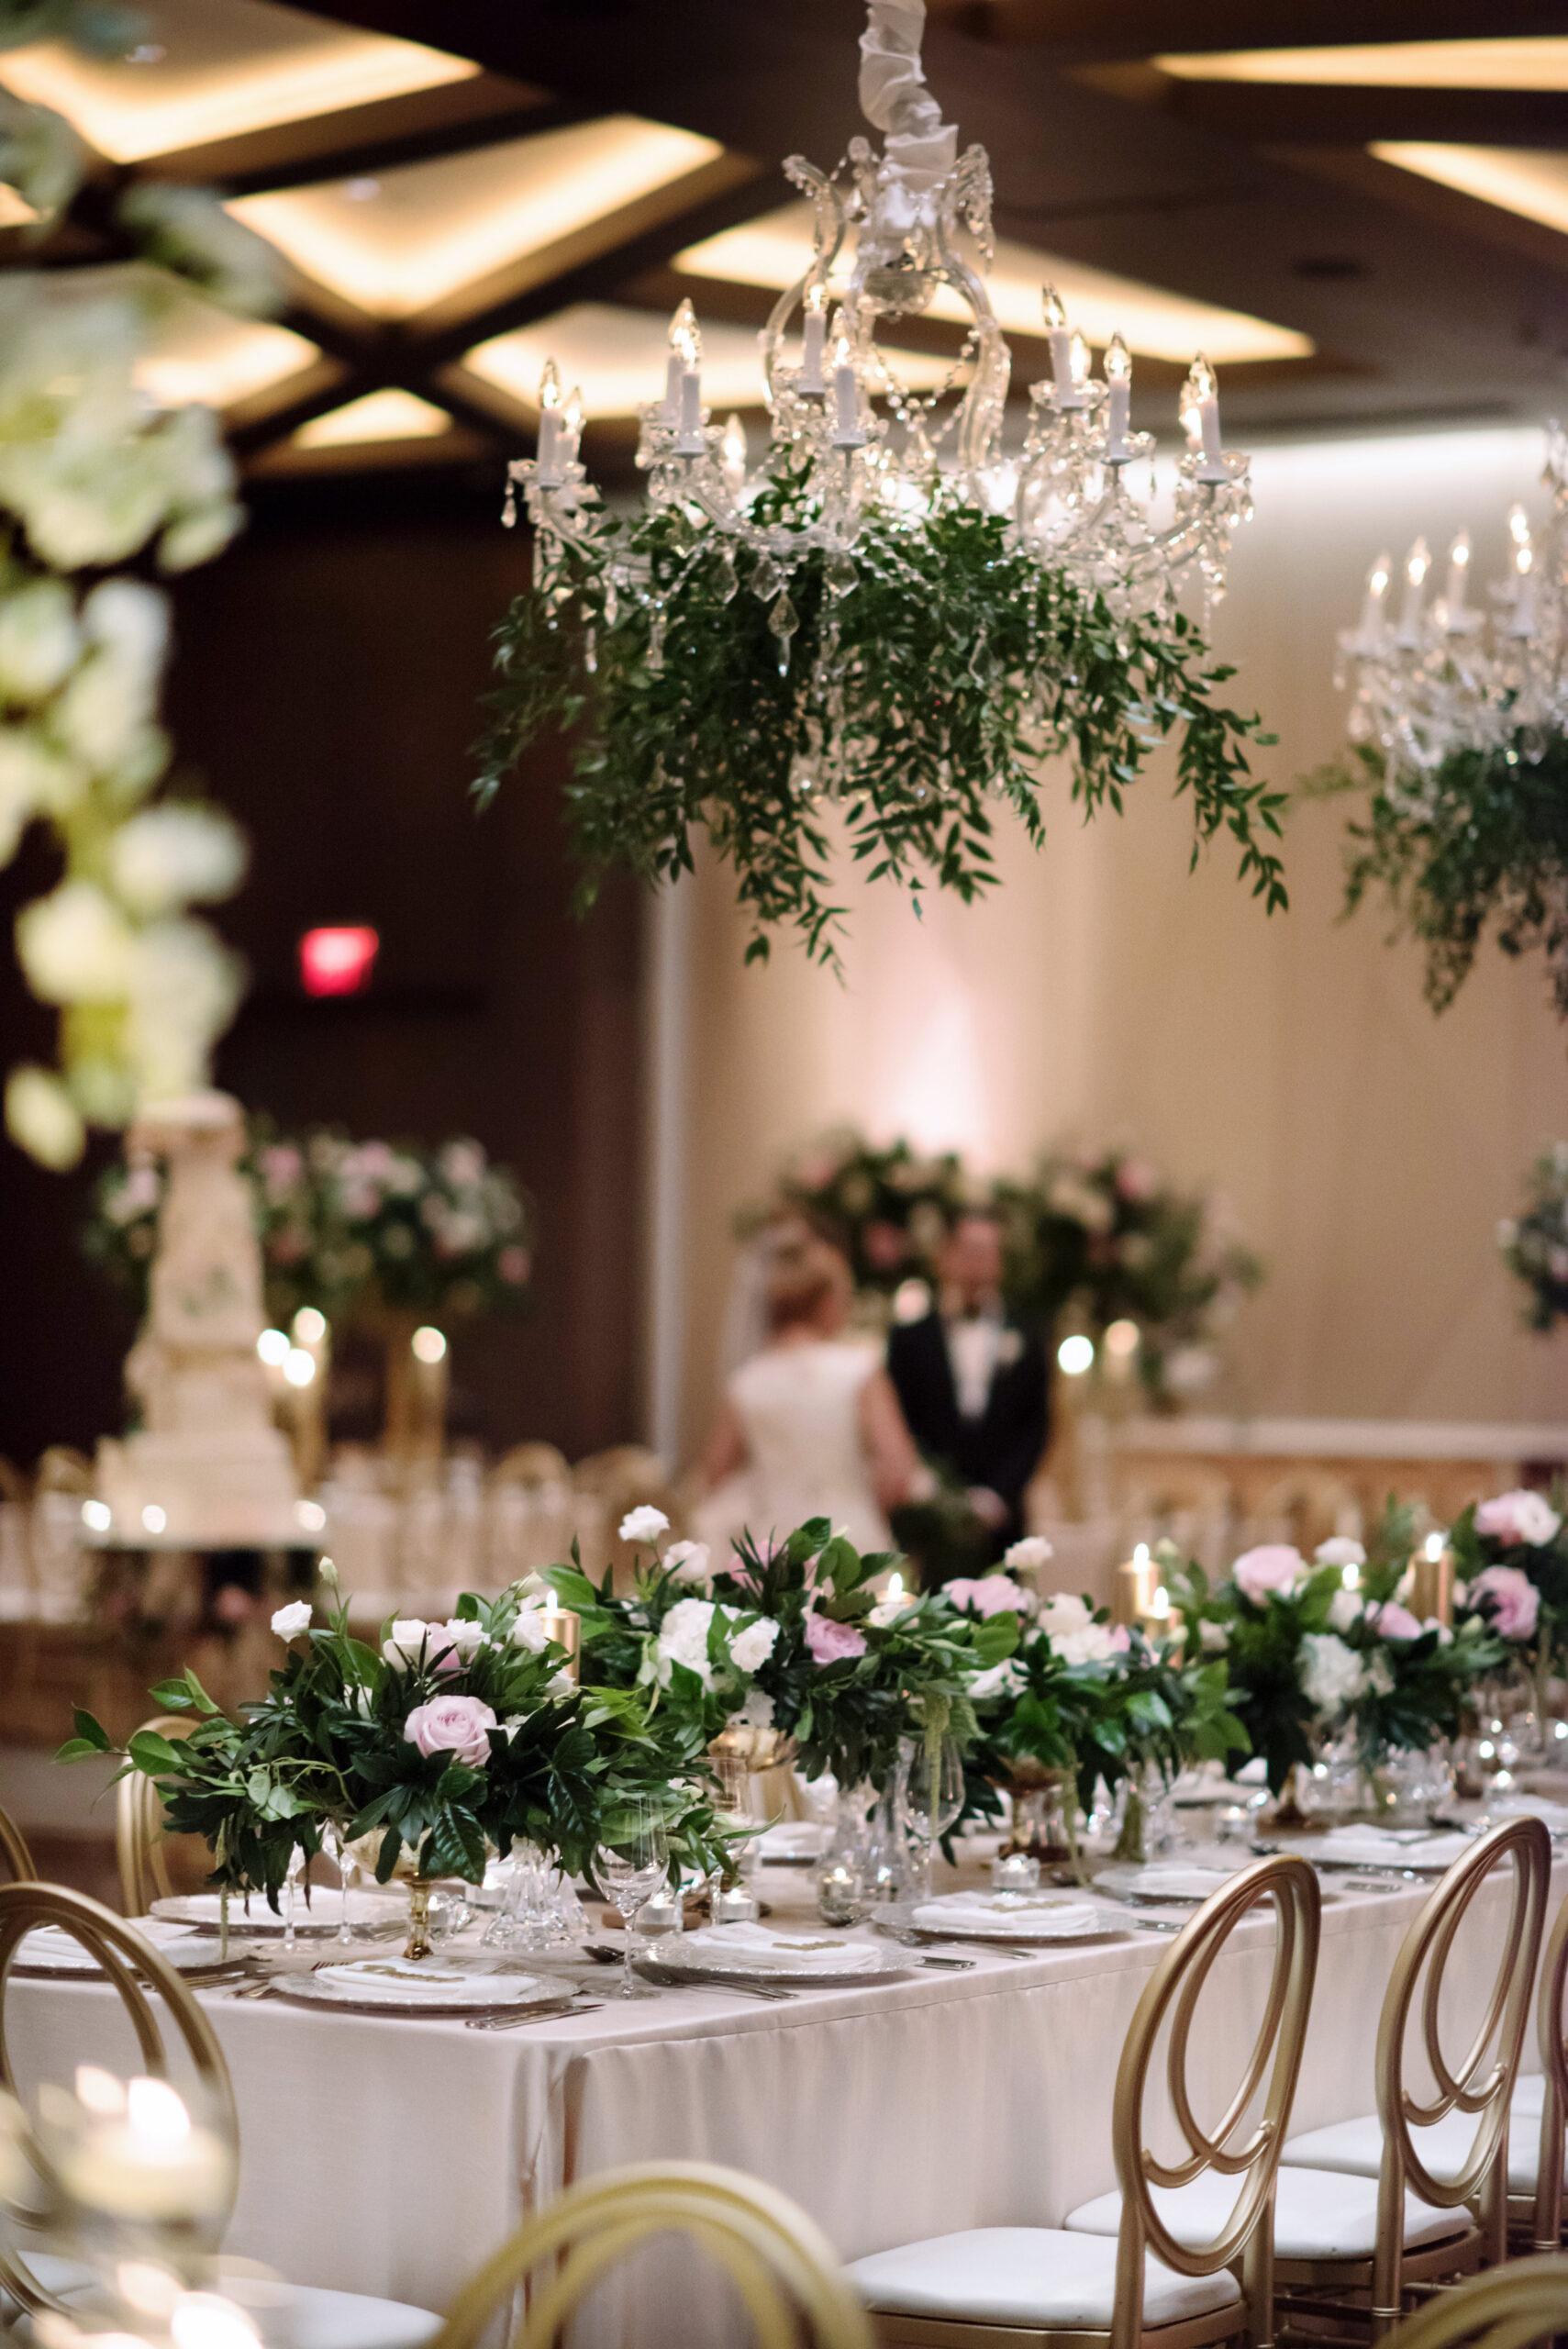 https://secureservercdn.net/45.40.145.151/kgq.ab5.myftpupload.com/wp-content/uploads/2020/04/Sanam-Soroush-s-Wedding-wedluxe-submission-0076-scaled.jpg?time=1627956768